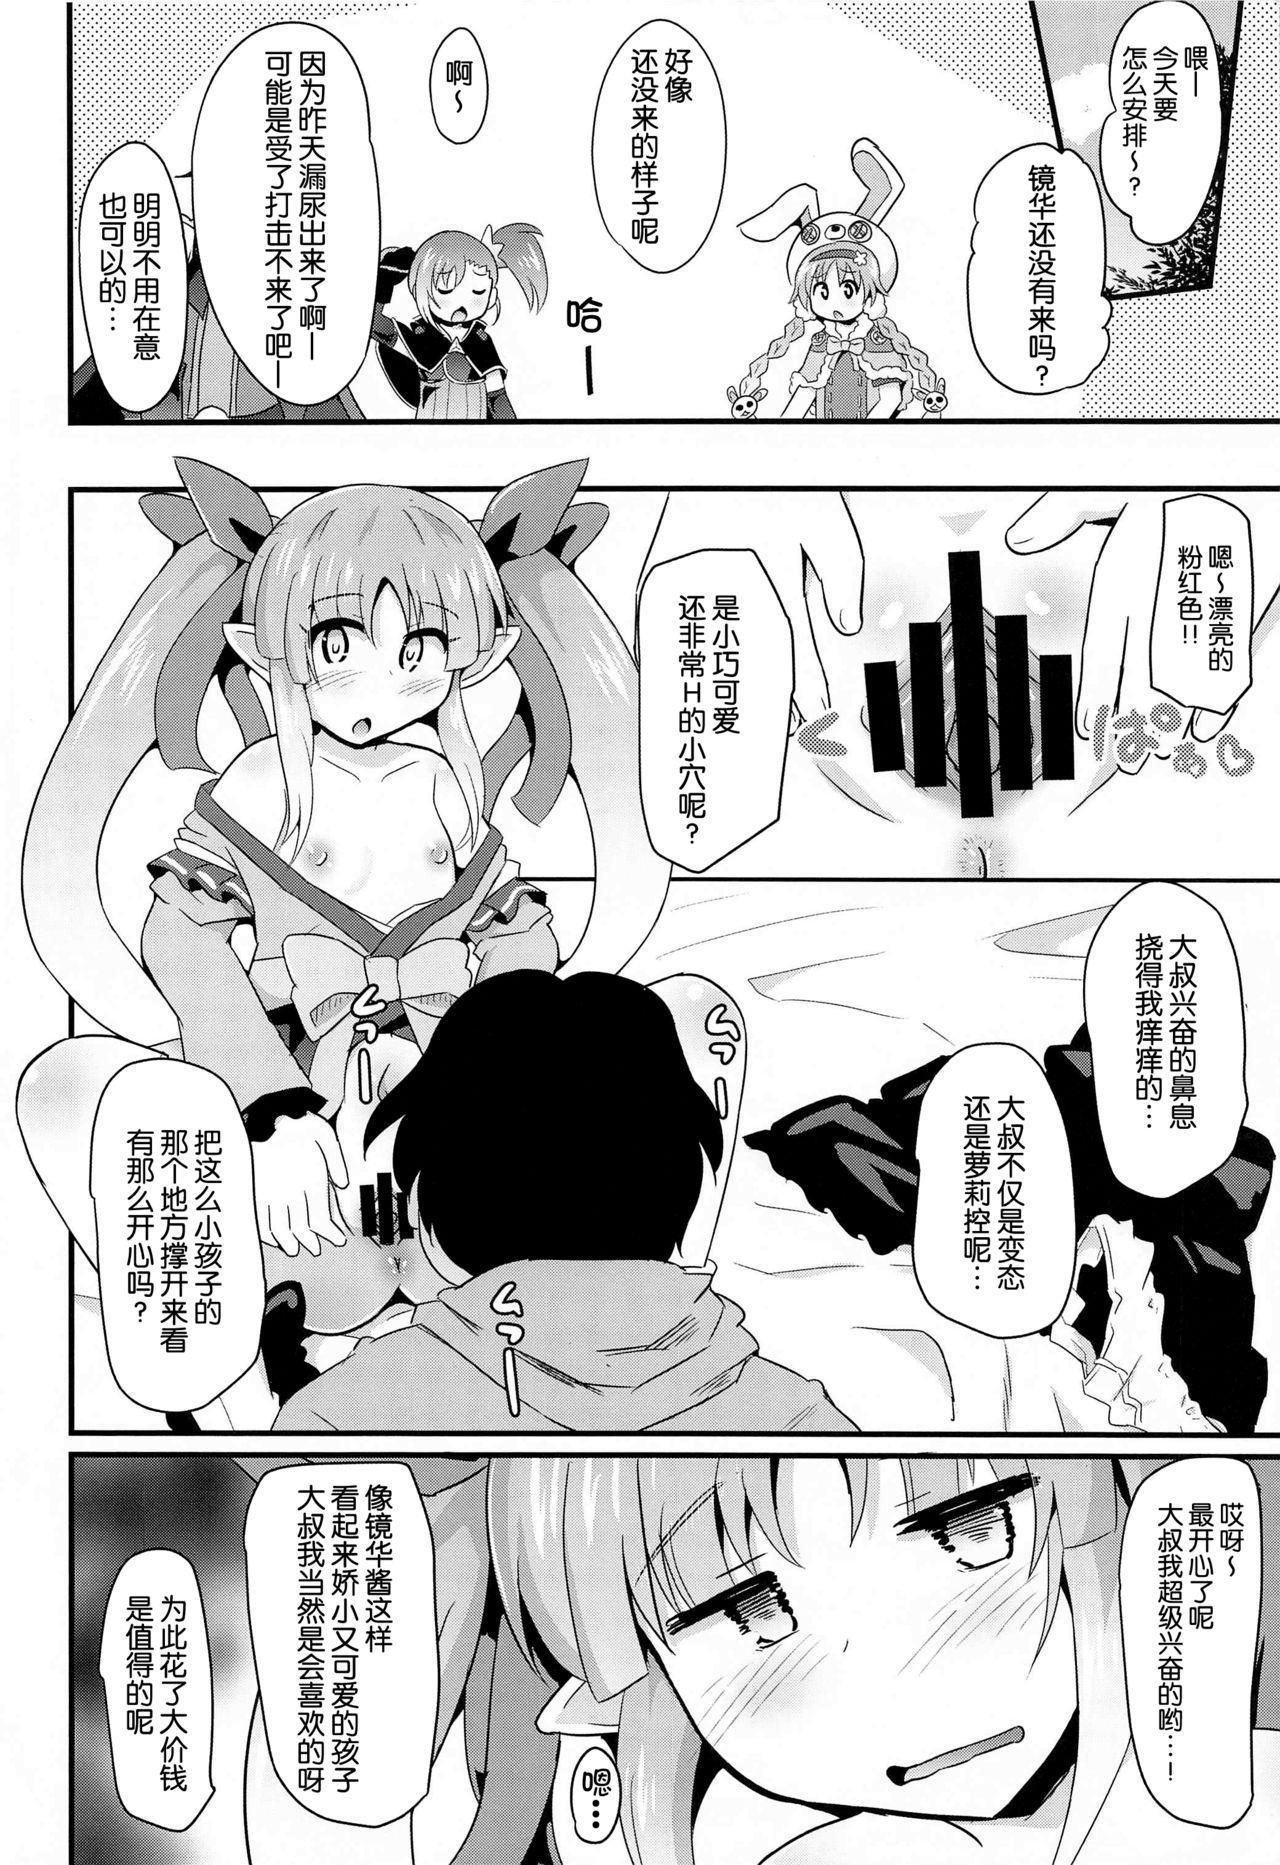 Kyouka-chan to Saimin Hentai Ecchi!! 9